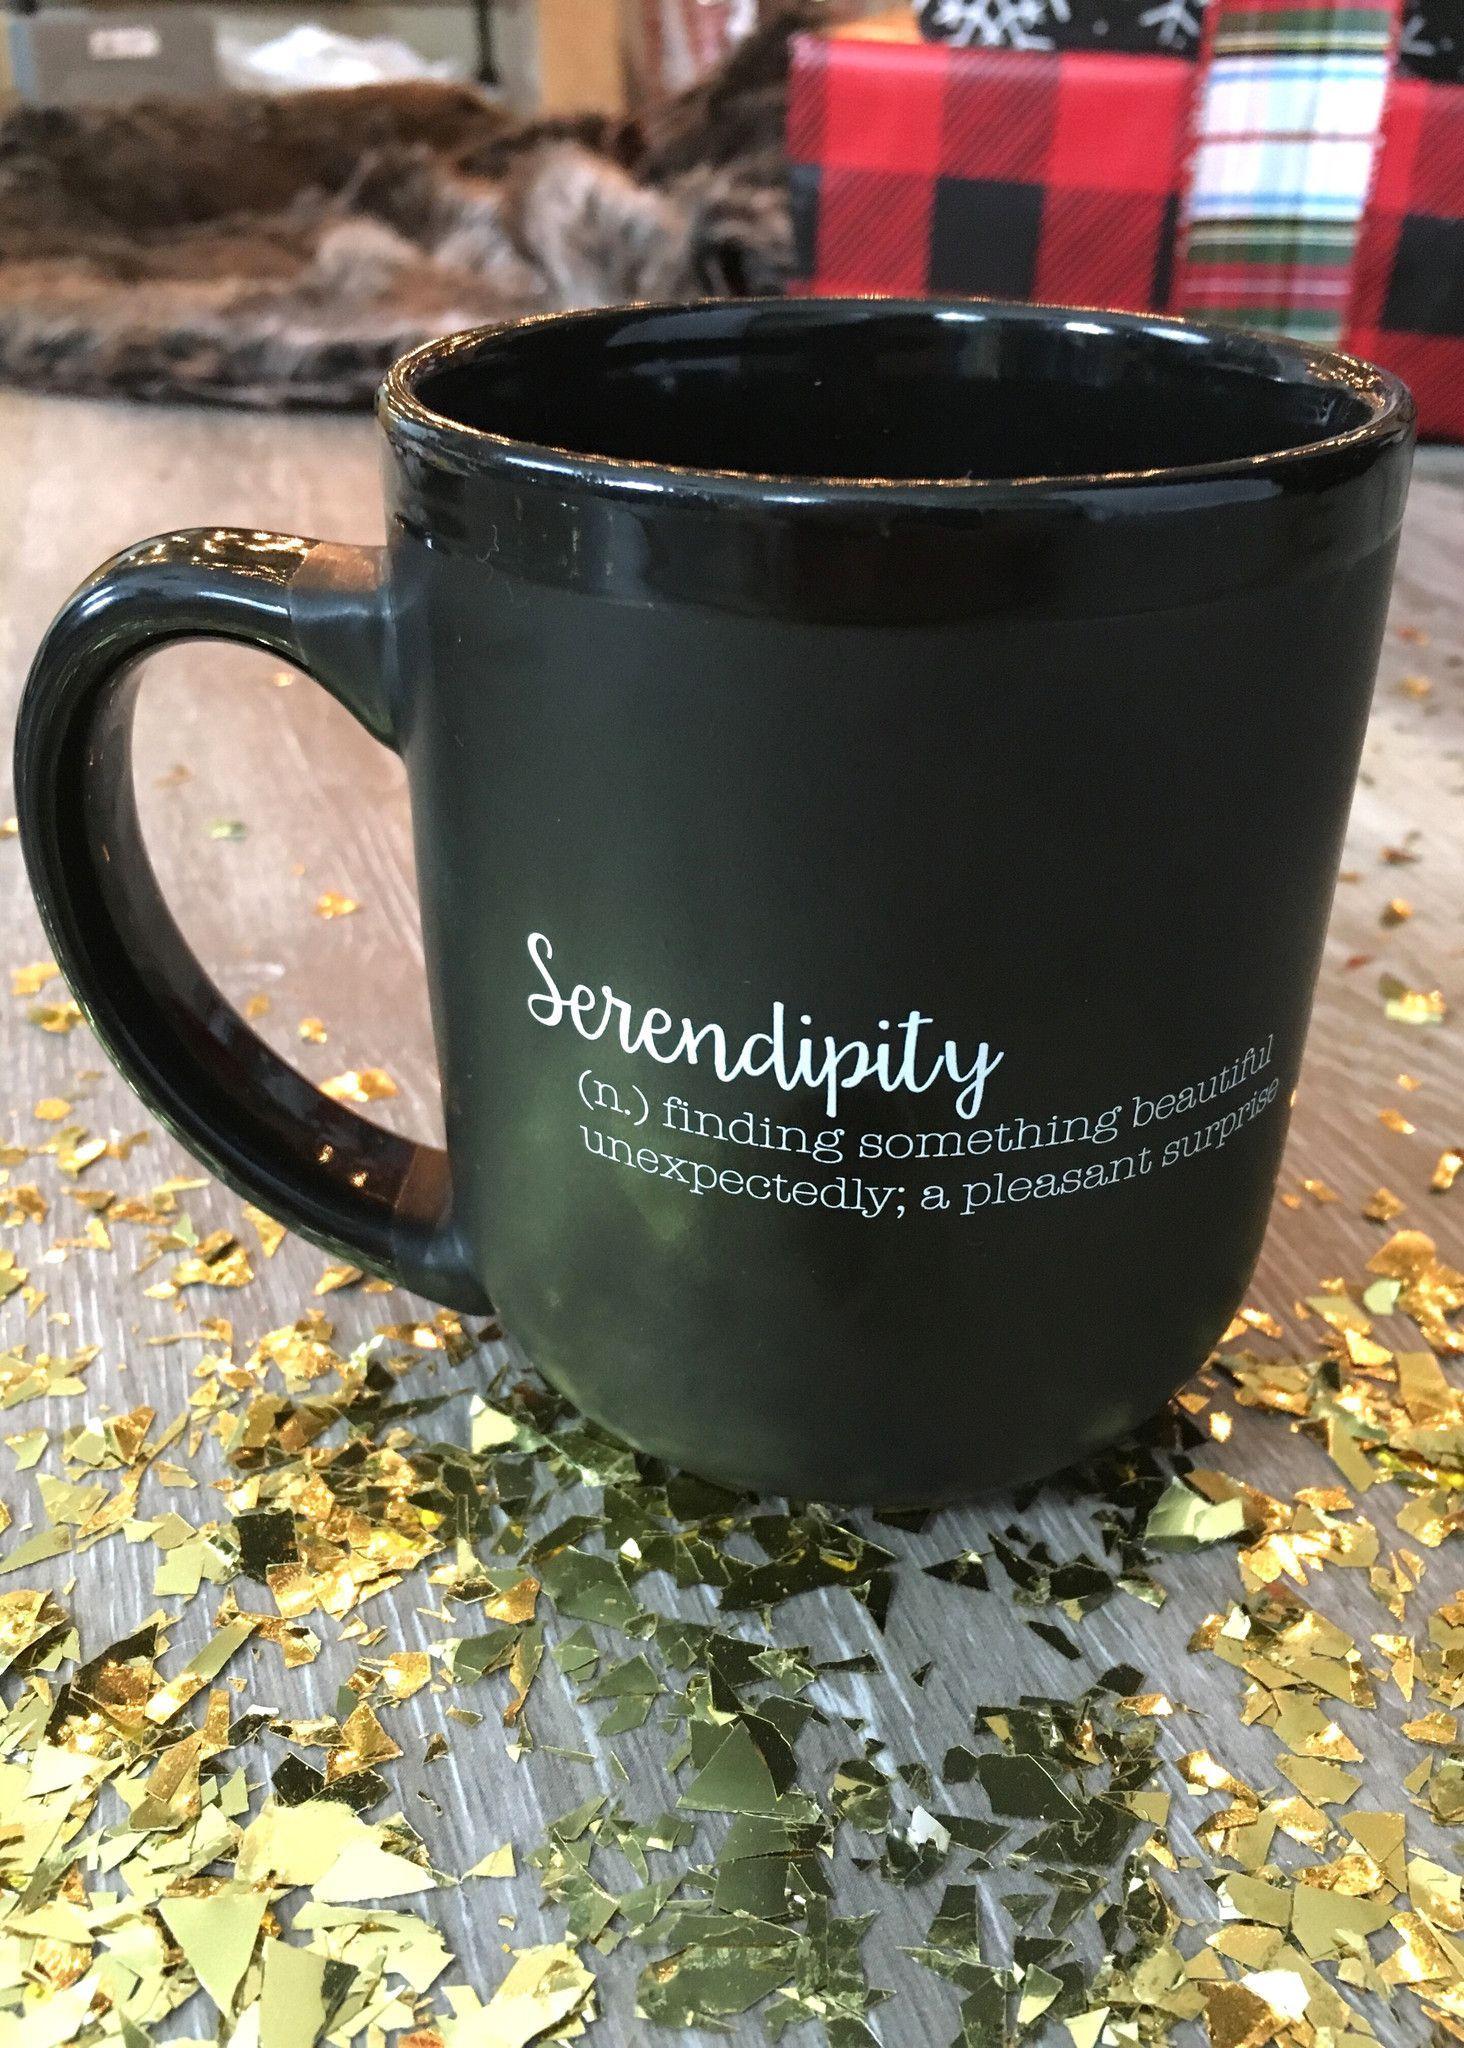 Serendipity Coffee Mug Coffee mugs, Mugs, Coffee obsession